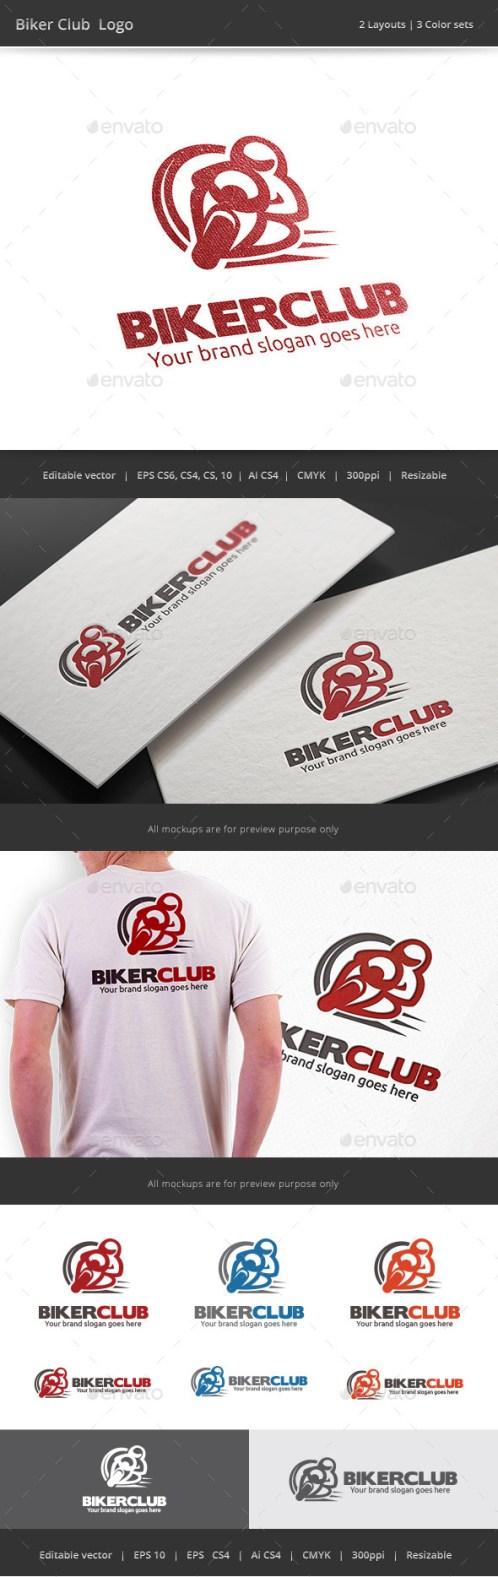 Logotipos para Clubes de Motoristas.